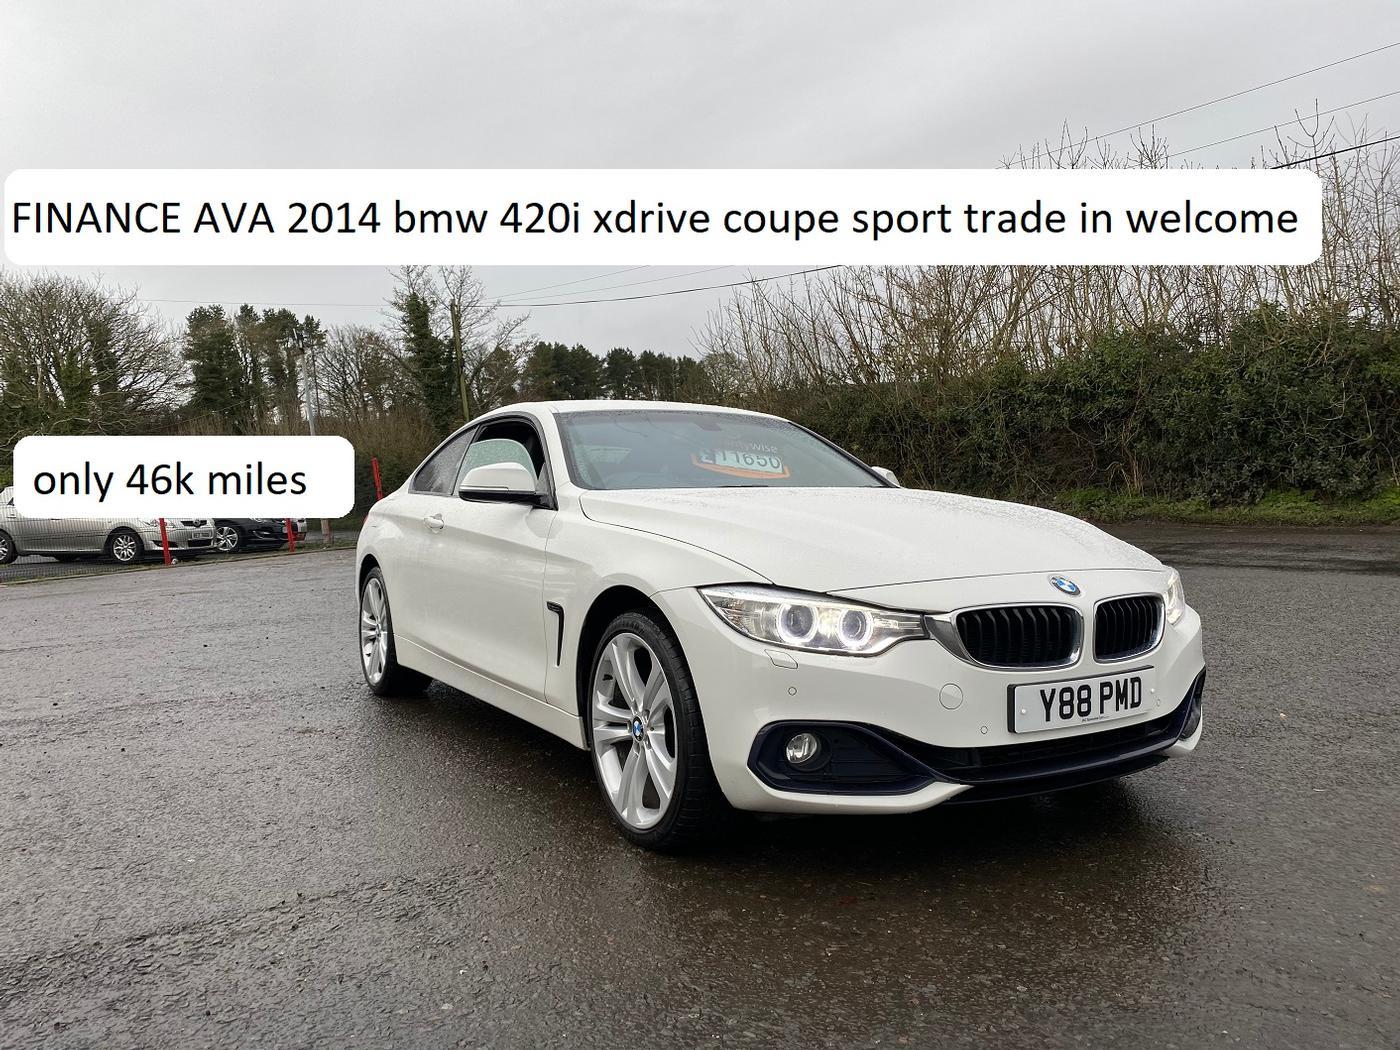 bmw 420i coupe sport